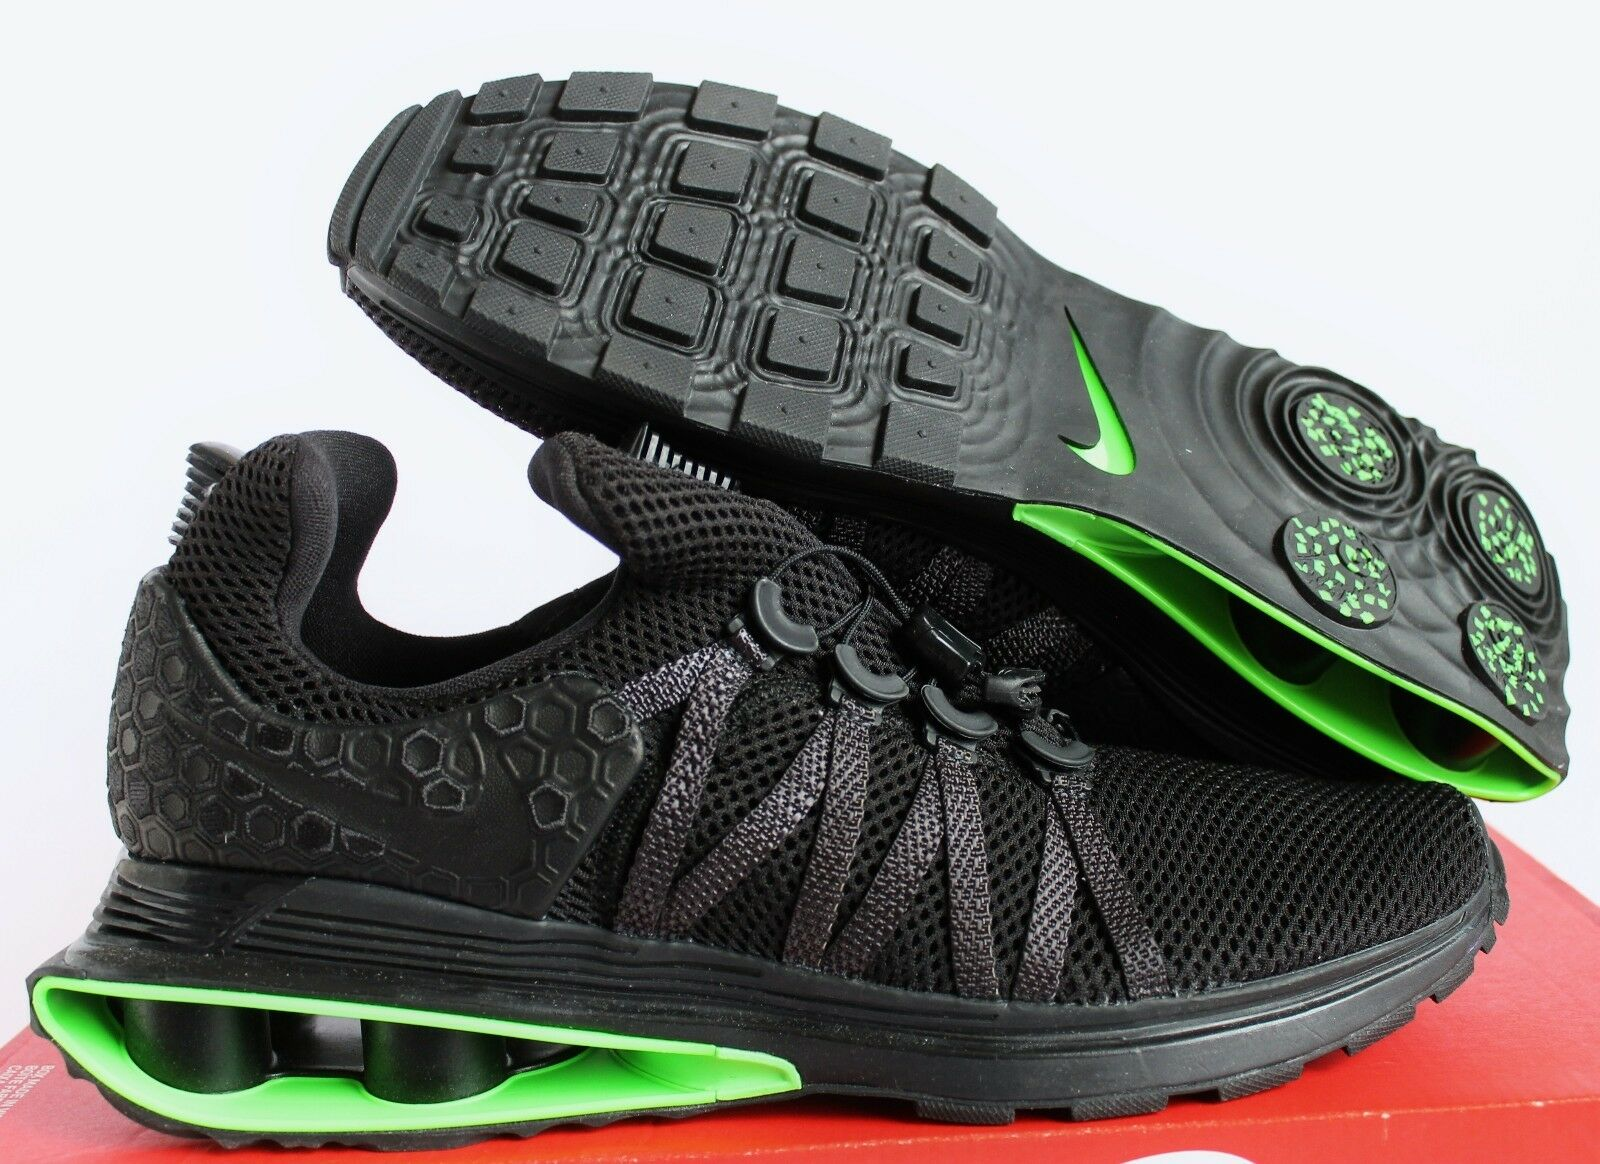 Nike shox shox Nike nz schwarz-schwarz-green schwerkraft luxe streik sz. 8324c6